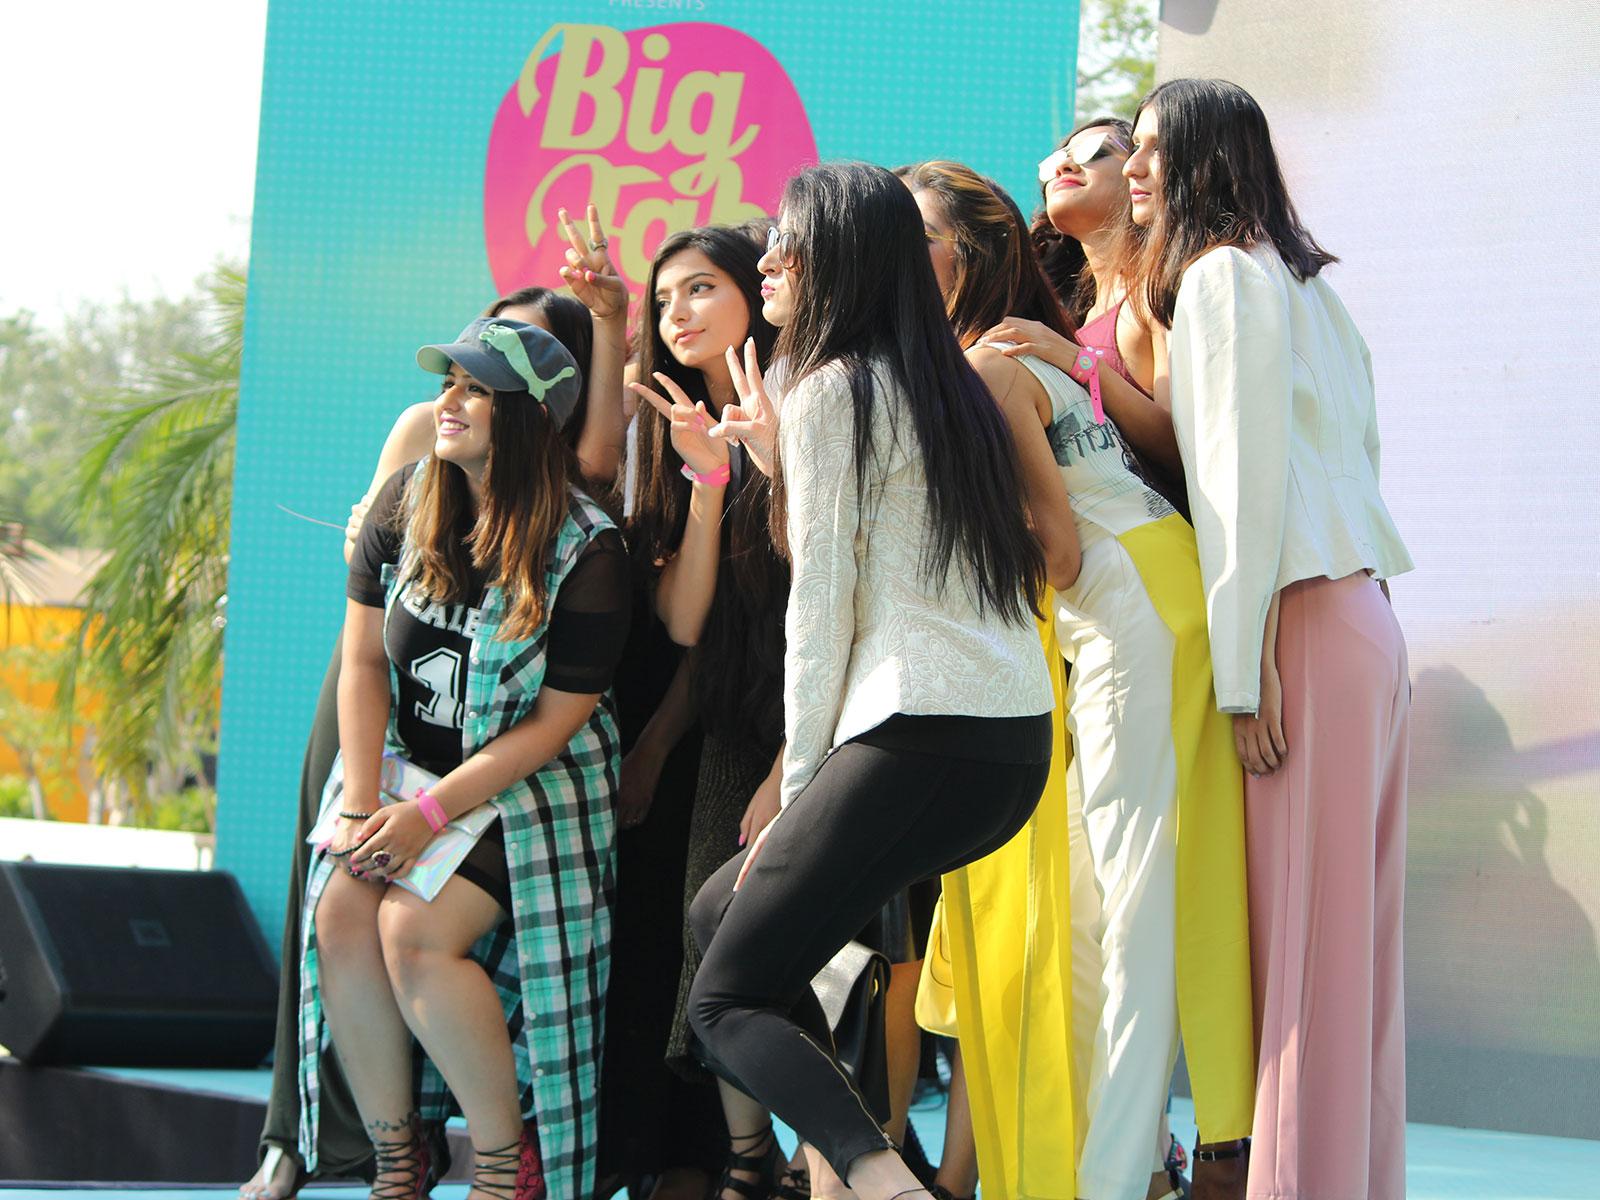 POPxo Bloggers at the POPxo Big Fab Fest held at Qla in Delhi